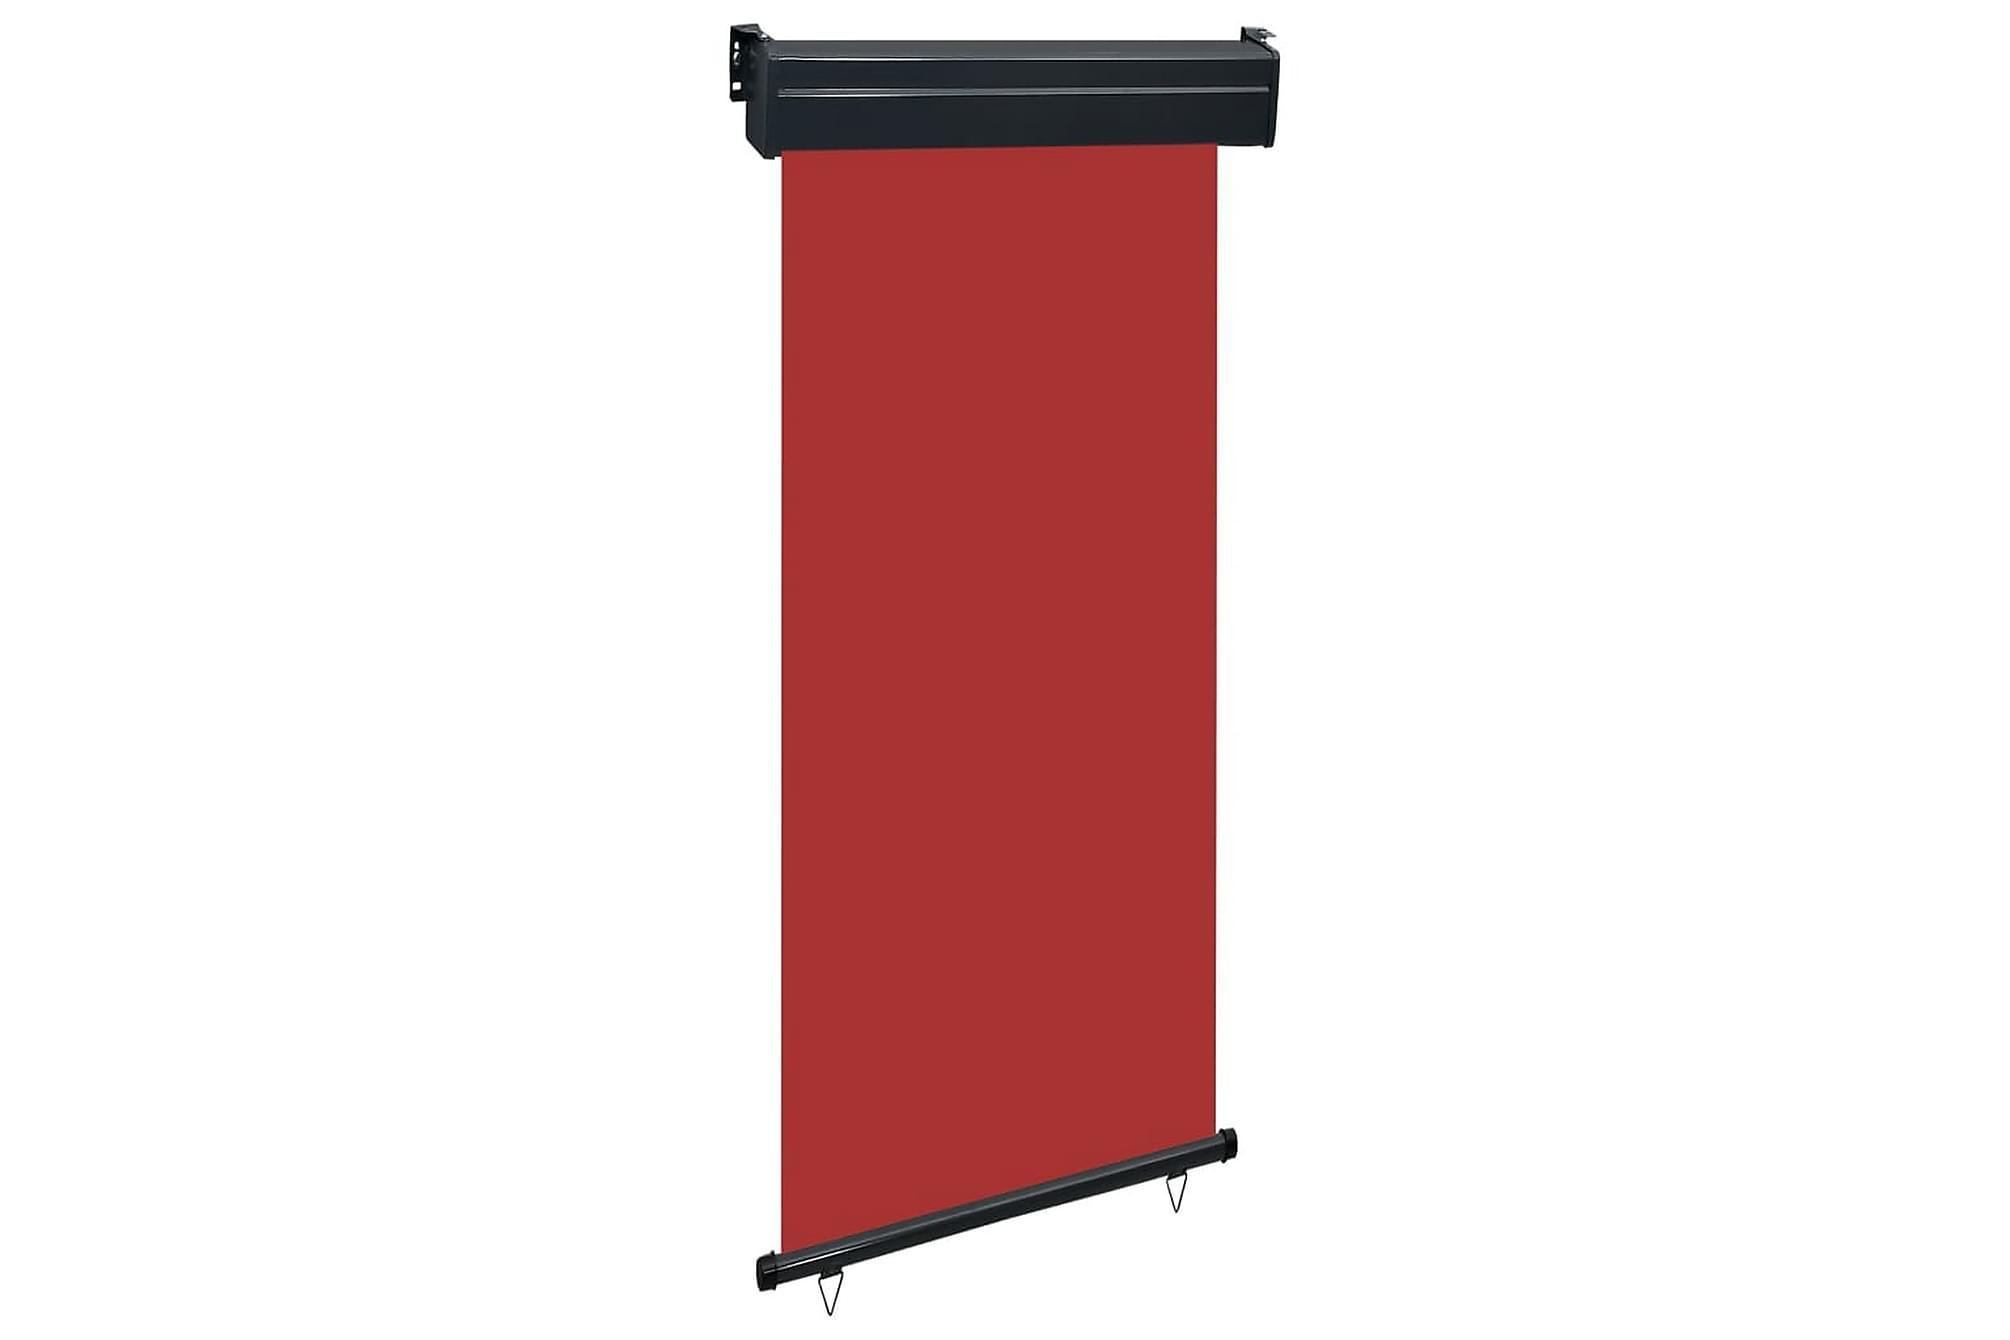 Balkongmarkis 100x250 cm röd, Markiser